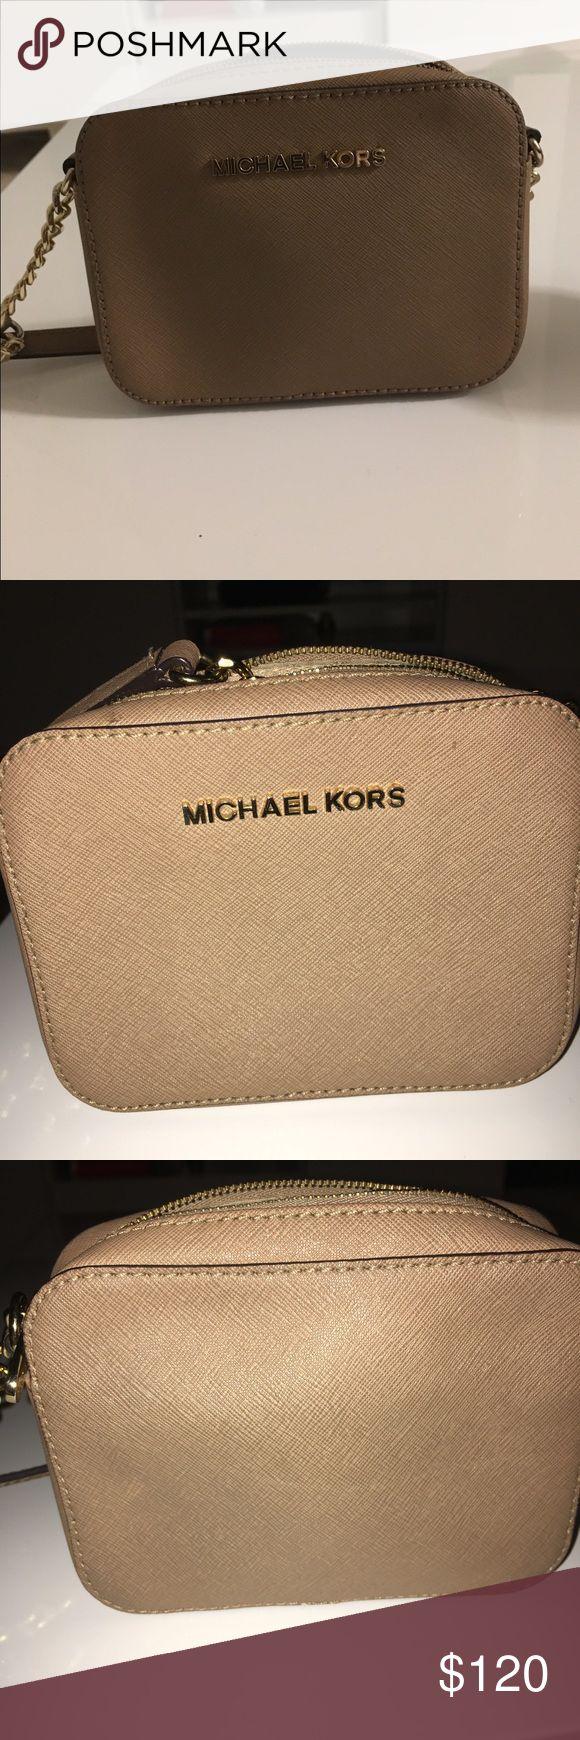 Michael Kors jet set cross body bag Michael Kors jet set cross body bag. Bags Crossbody Bags